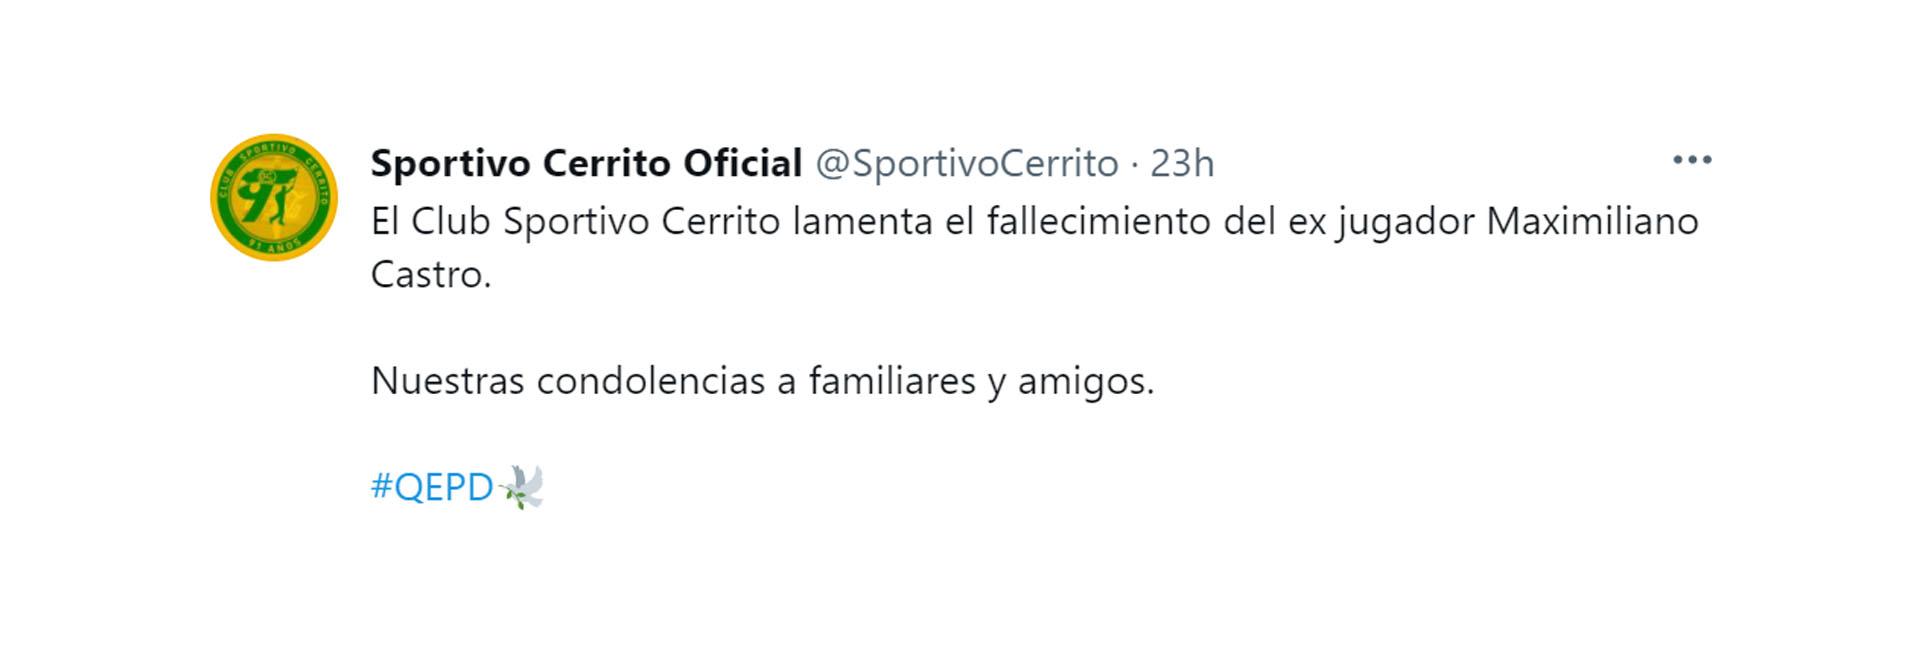 Shock in Uruguay former soccer player Maximiliano Castro was found